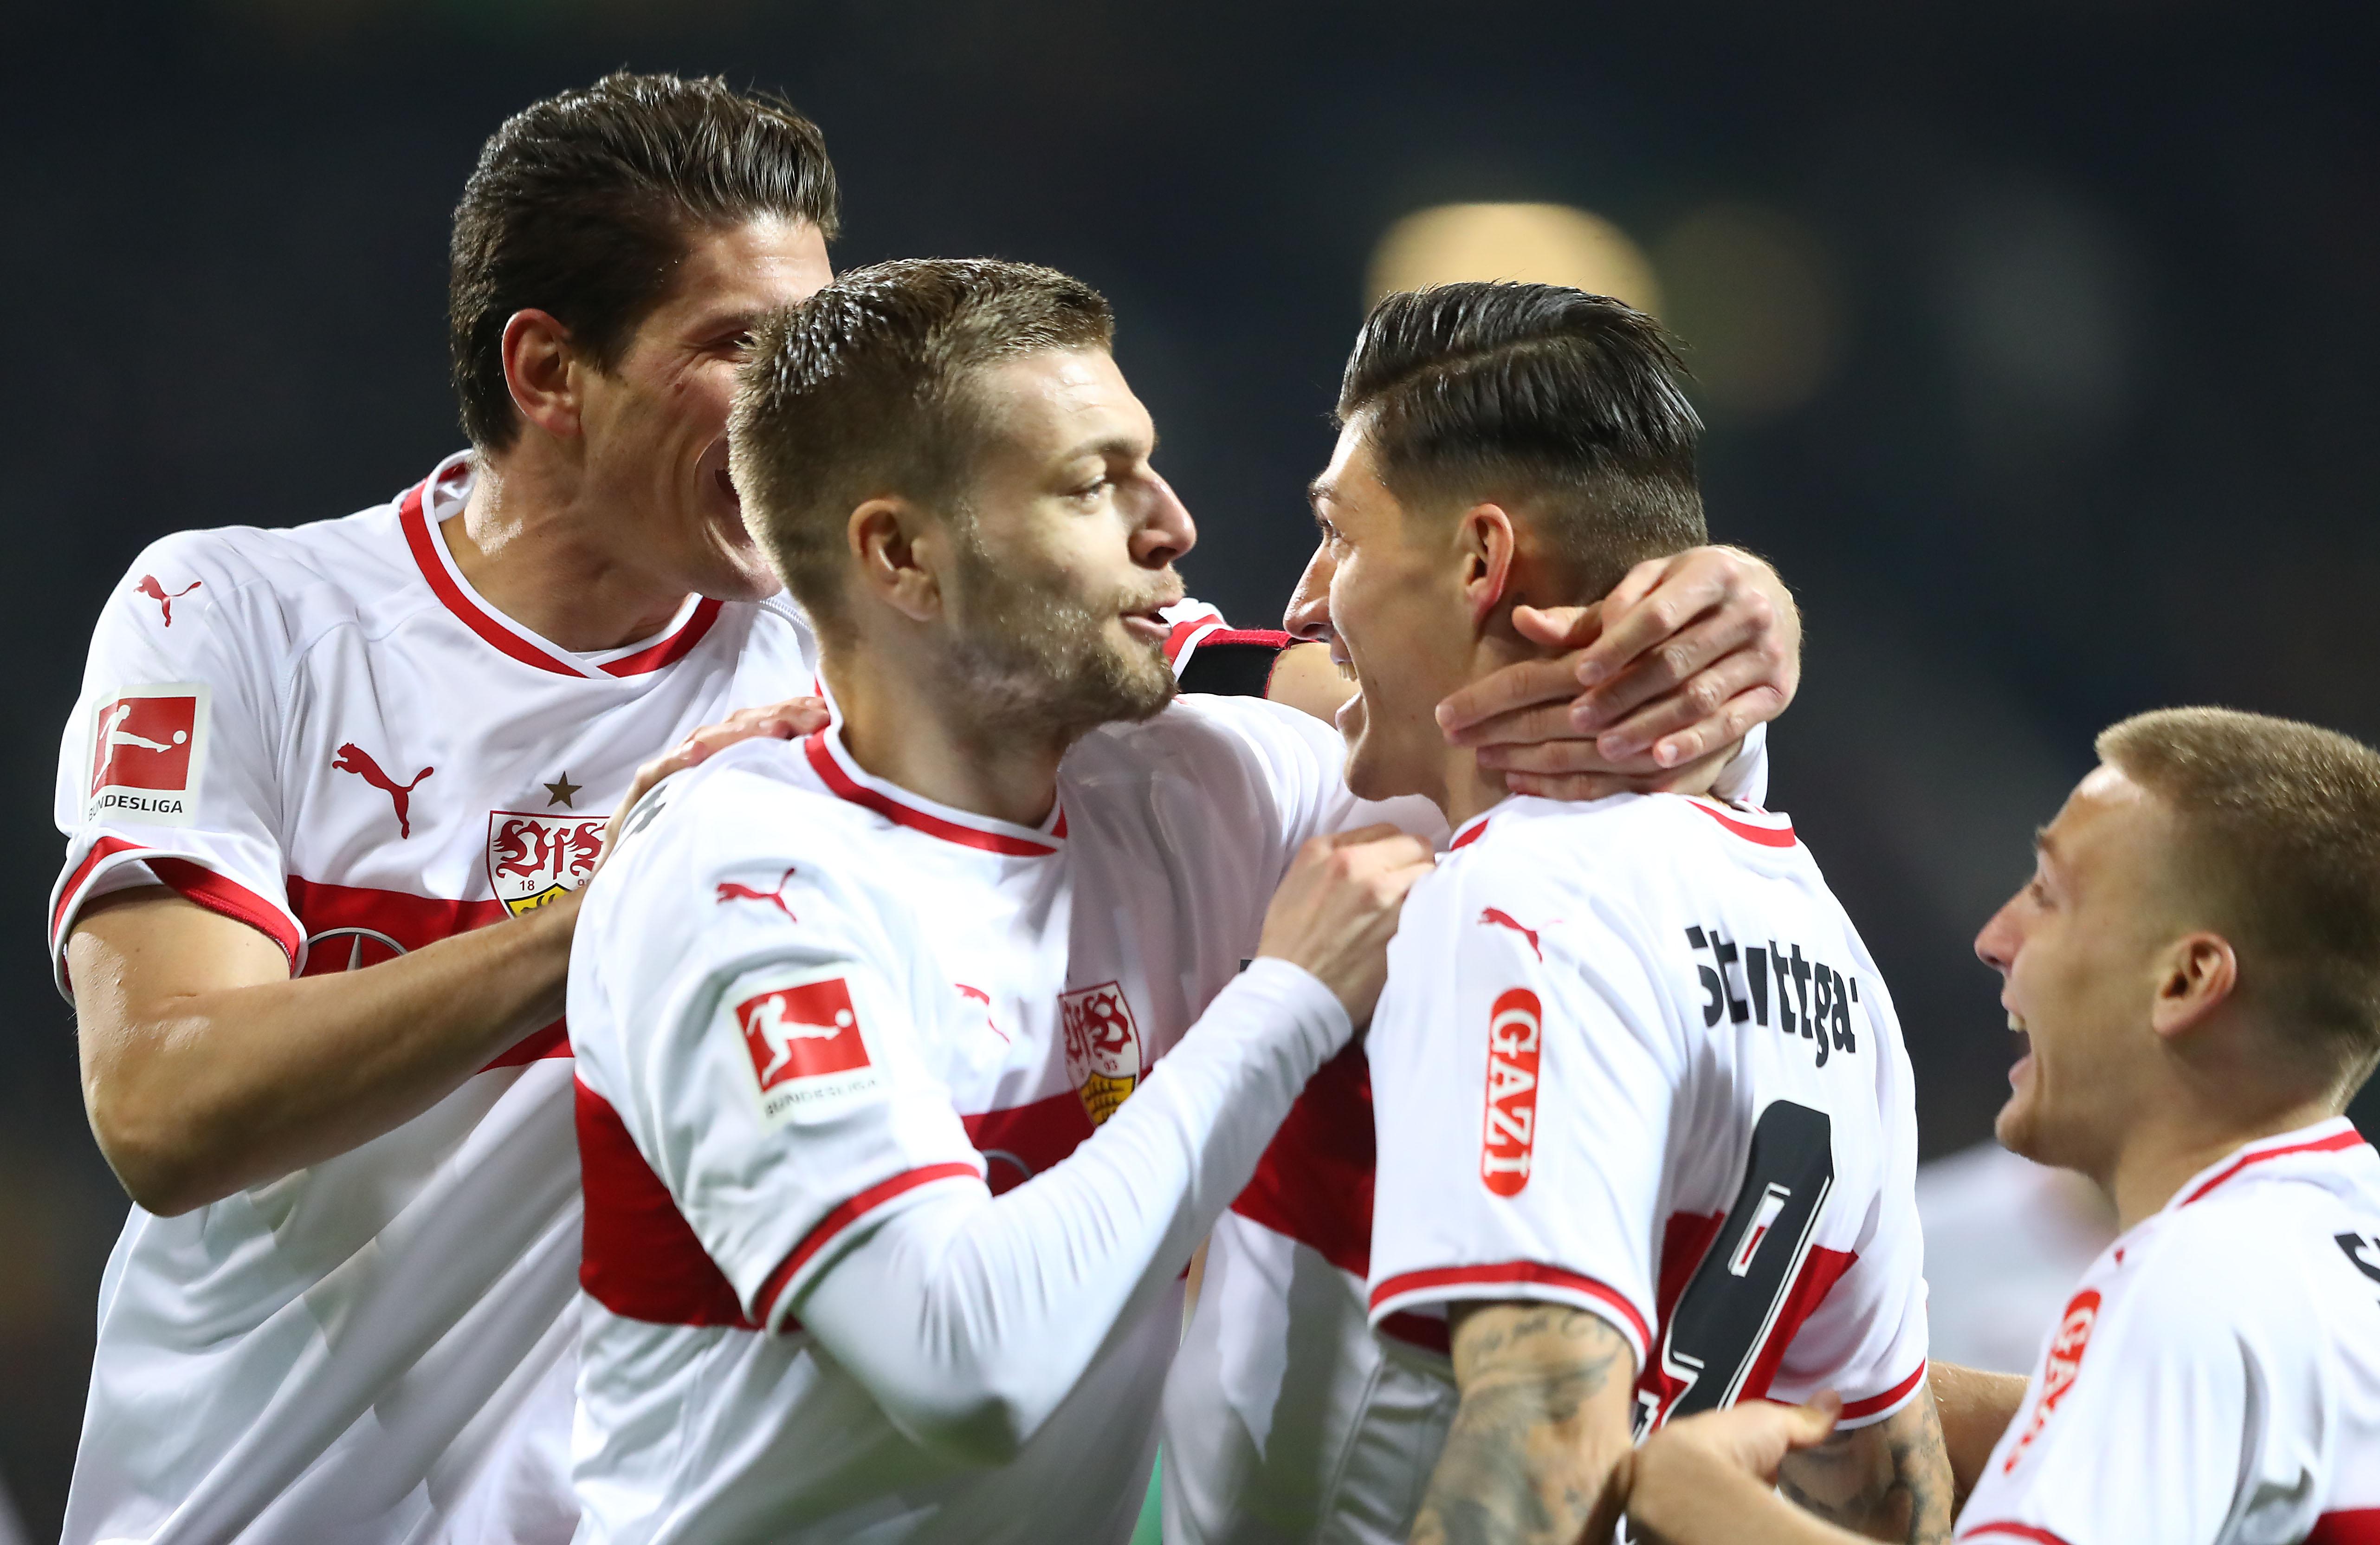 Relegationsspiel stuttgart gegen union berlin